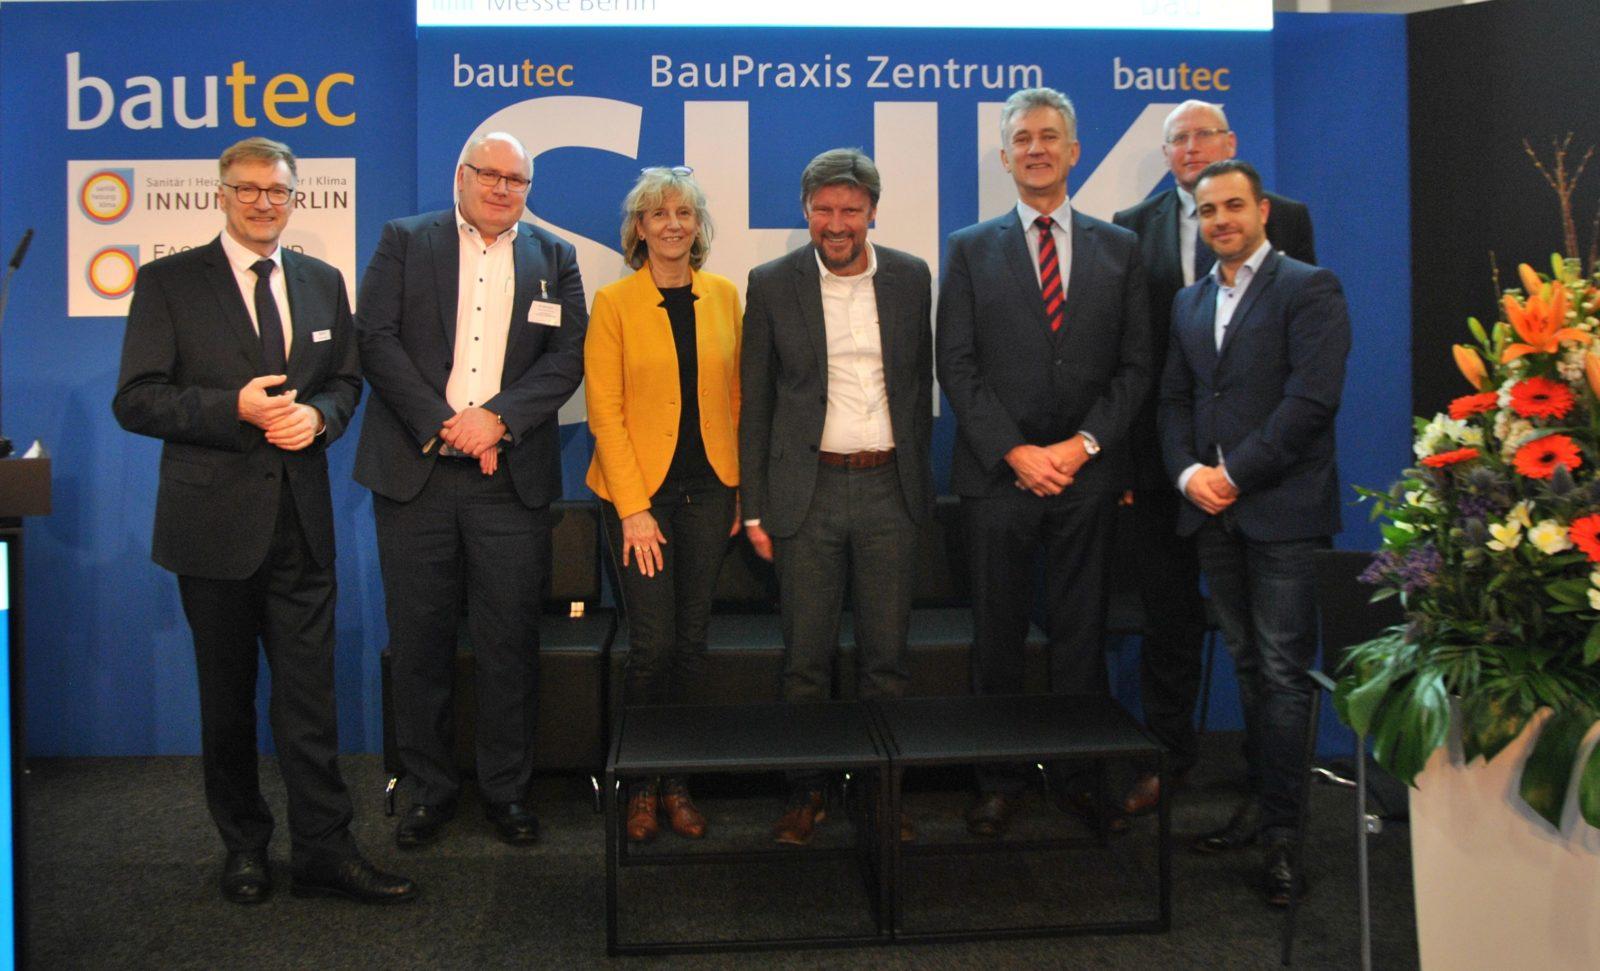 bautec 2020: InnoTreff Brandschutz